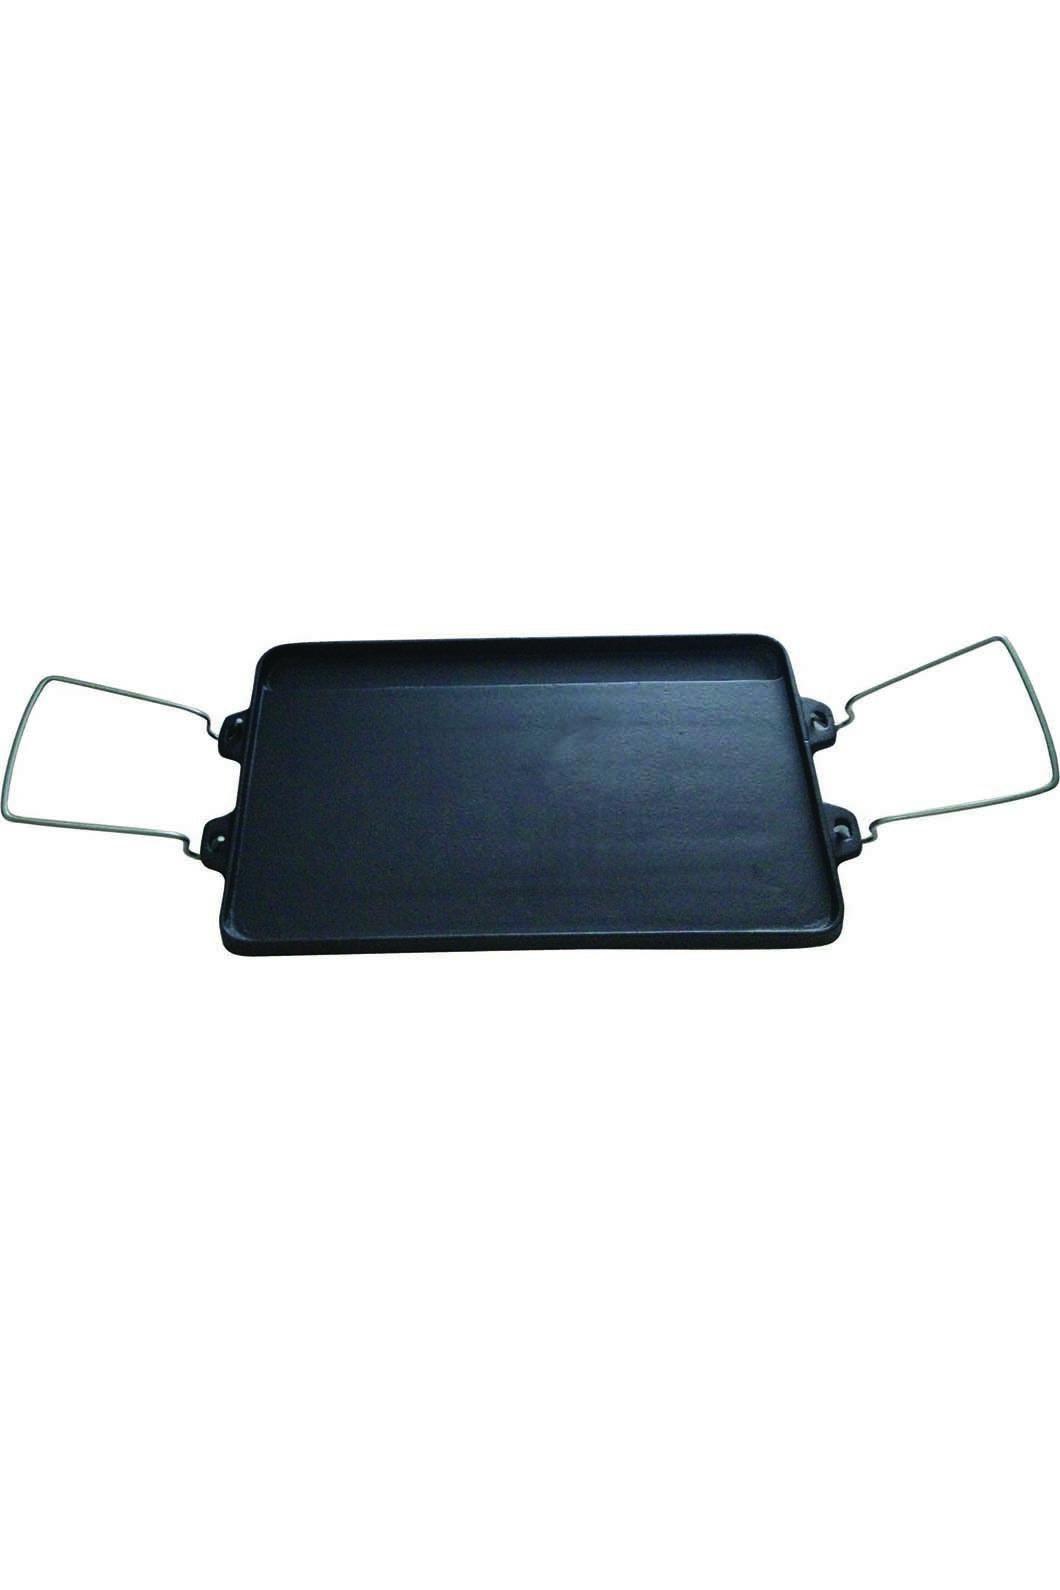 Wanderer 2 Burner Reversible Cast Iron Cook Plate, None, hi-res